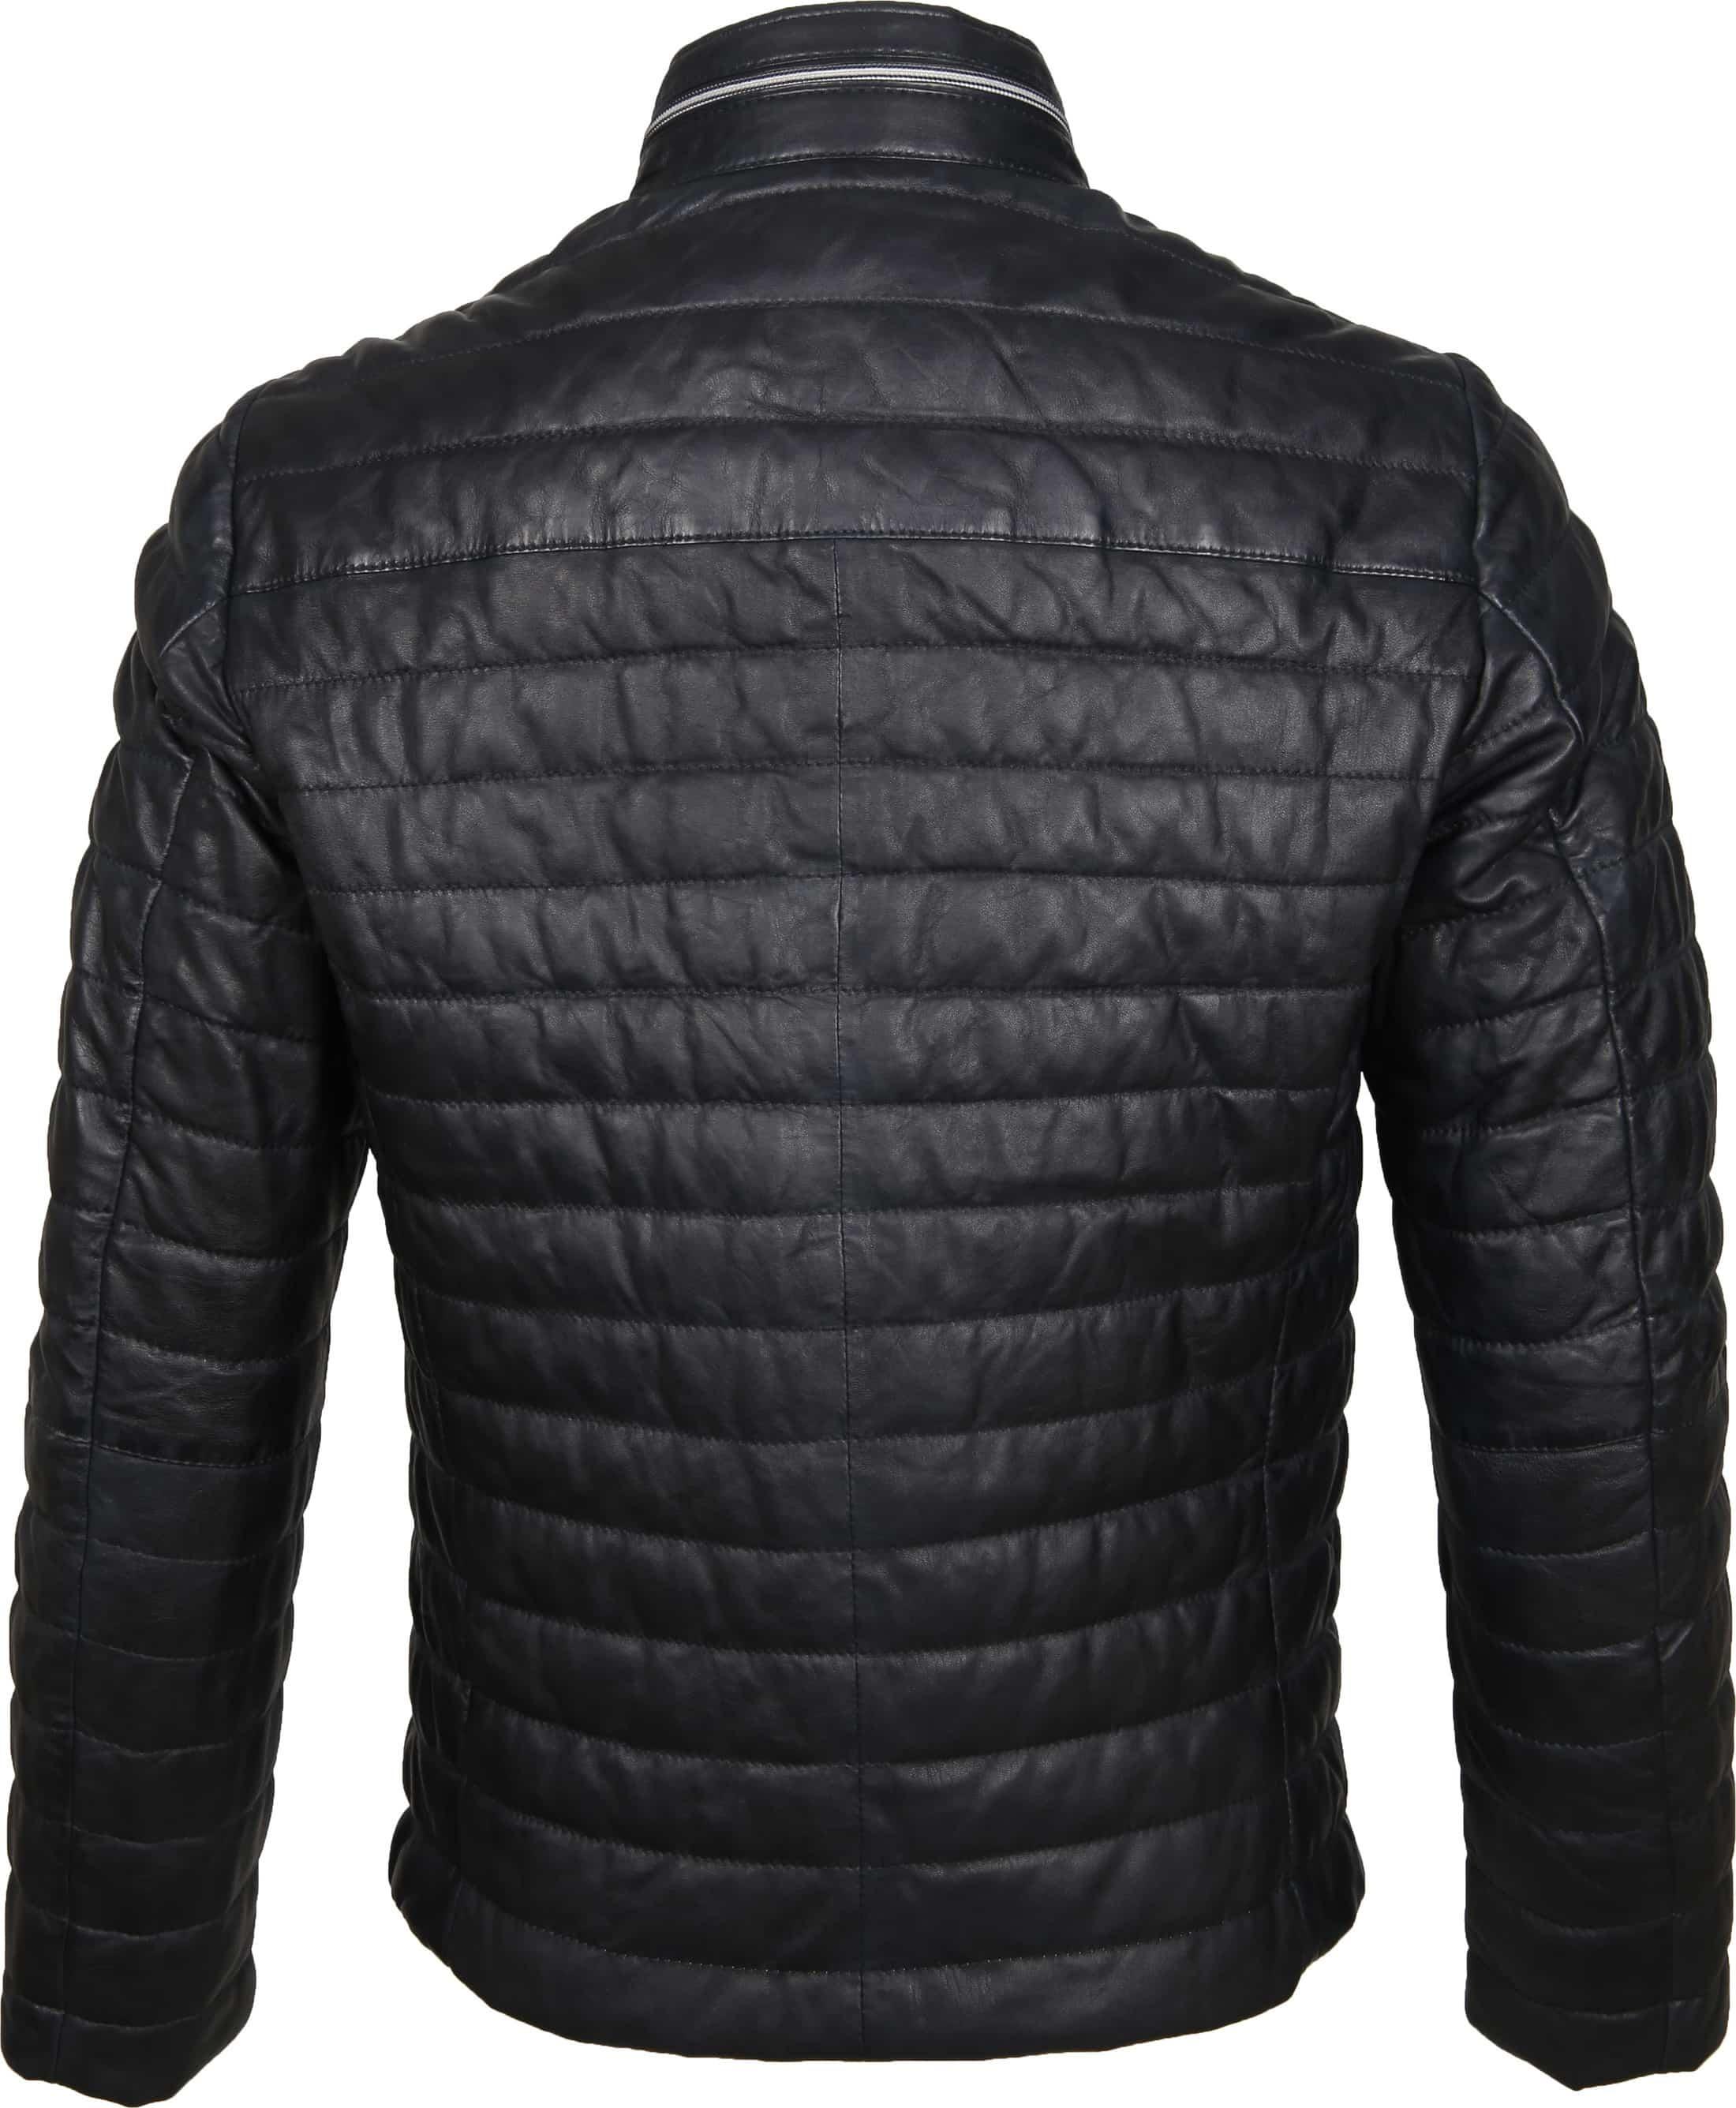 Milestone Tereno Leather Jack Navy Grey foto 5